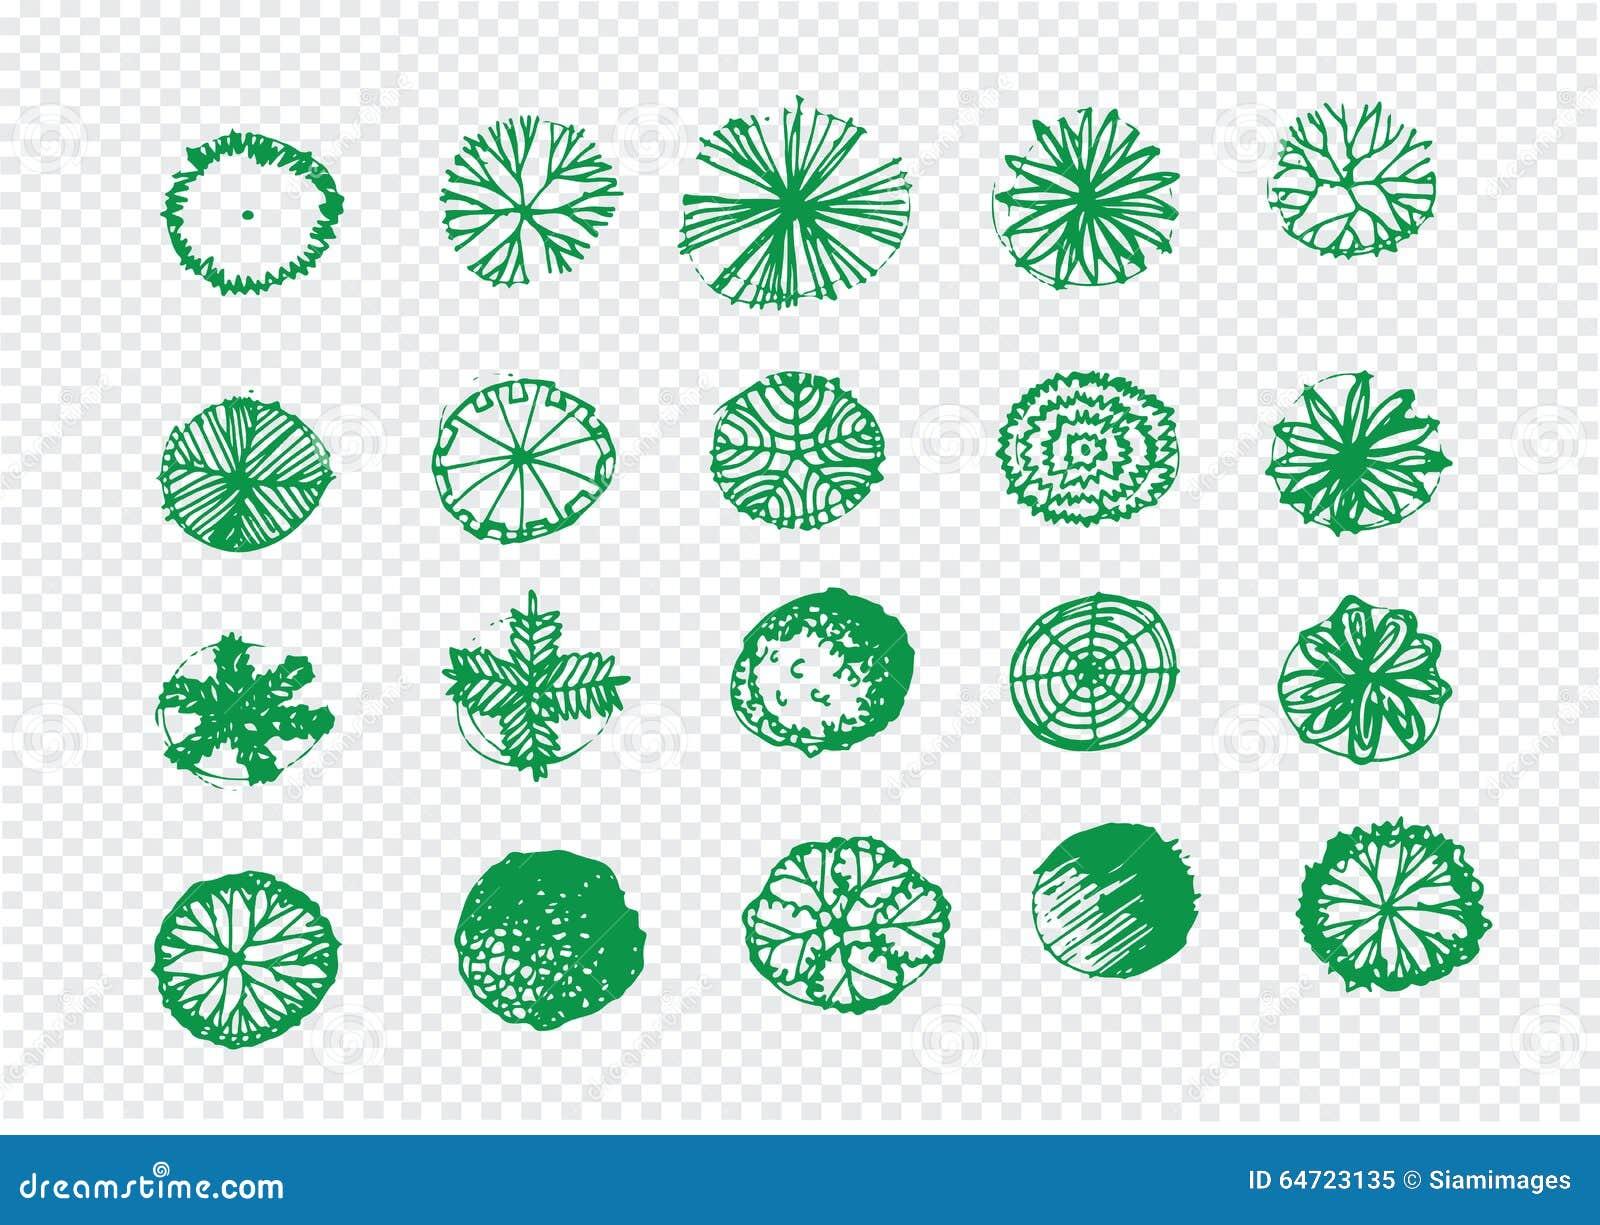 Landscape design top view vector elements vector for Garden design elements